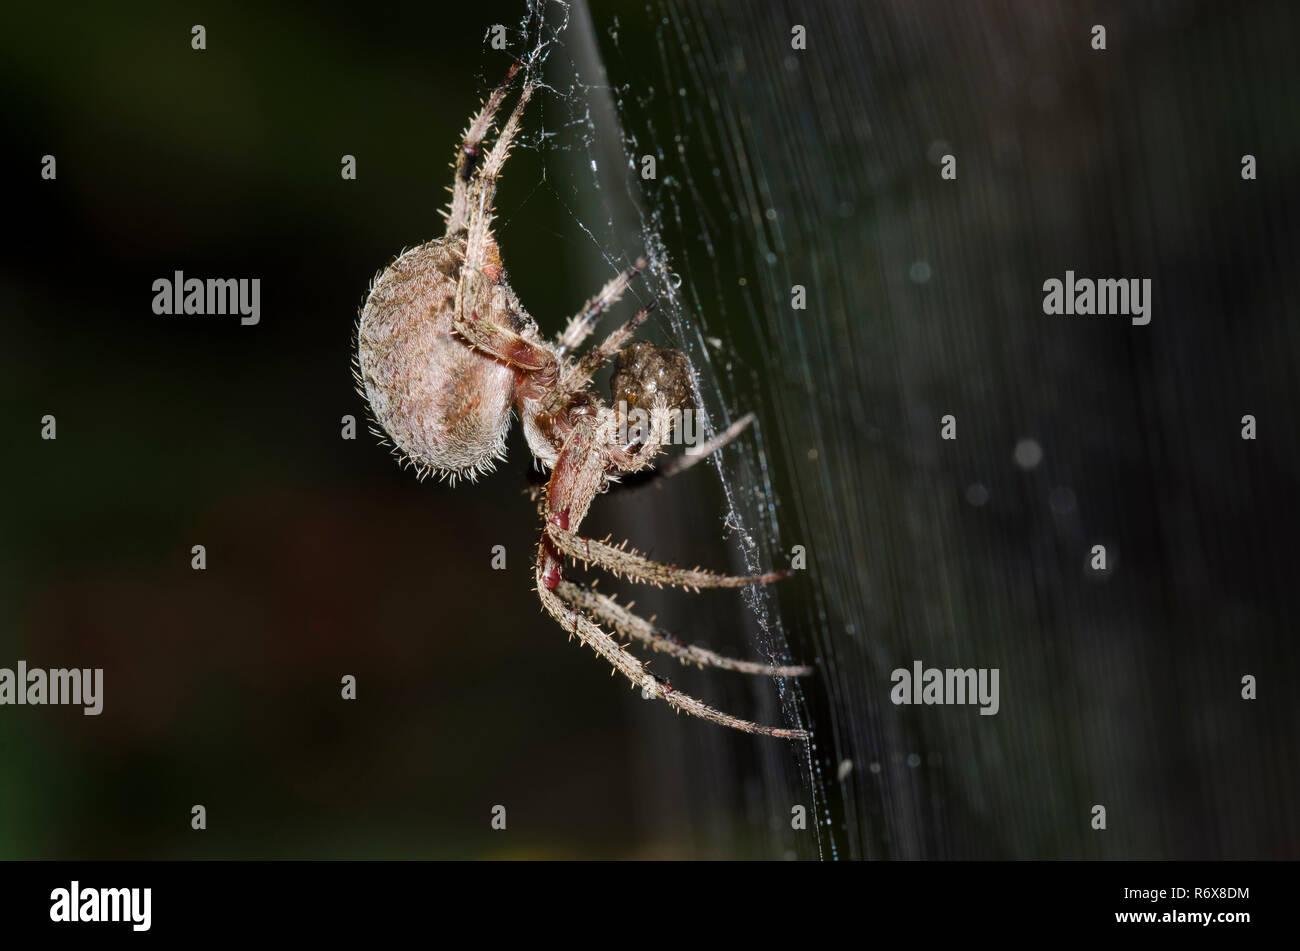 Spotted Orbweaver, Neoscona sp., with prey - Stock Image